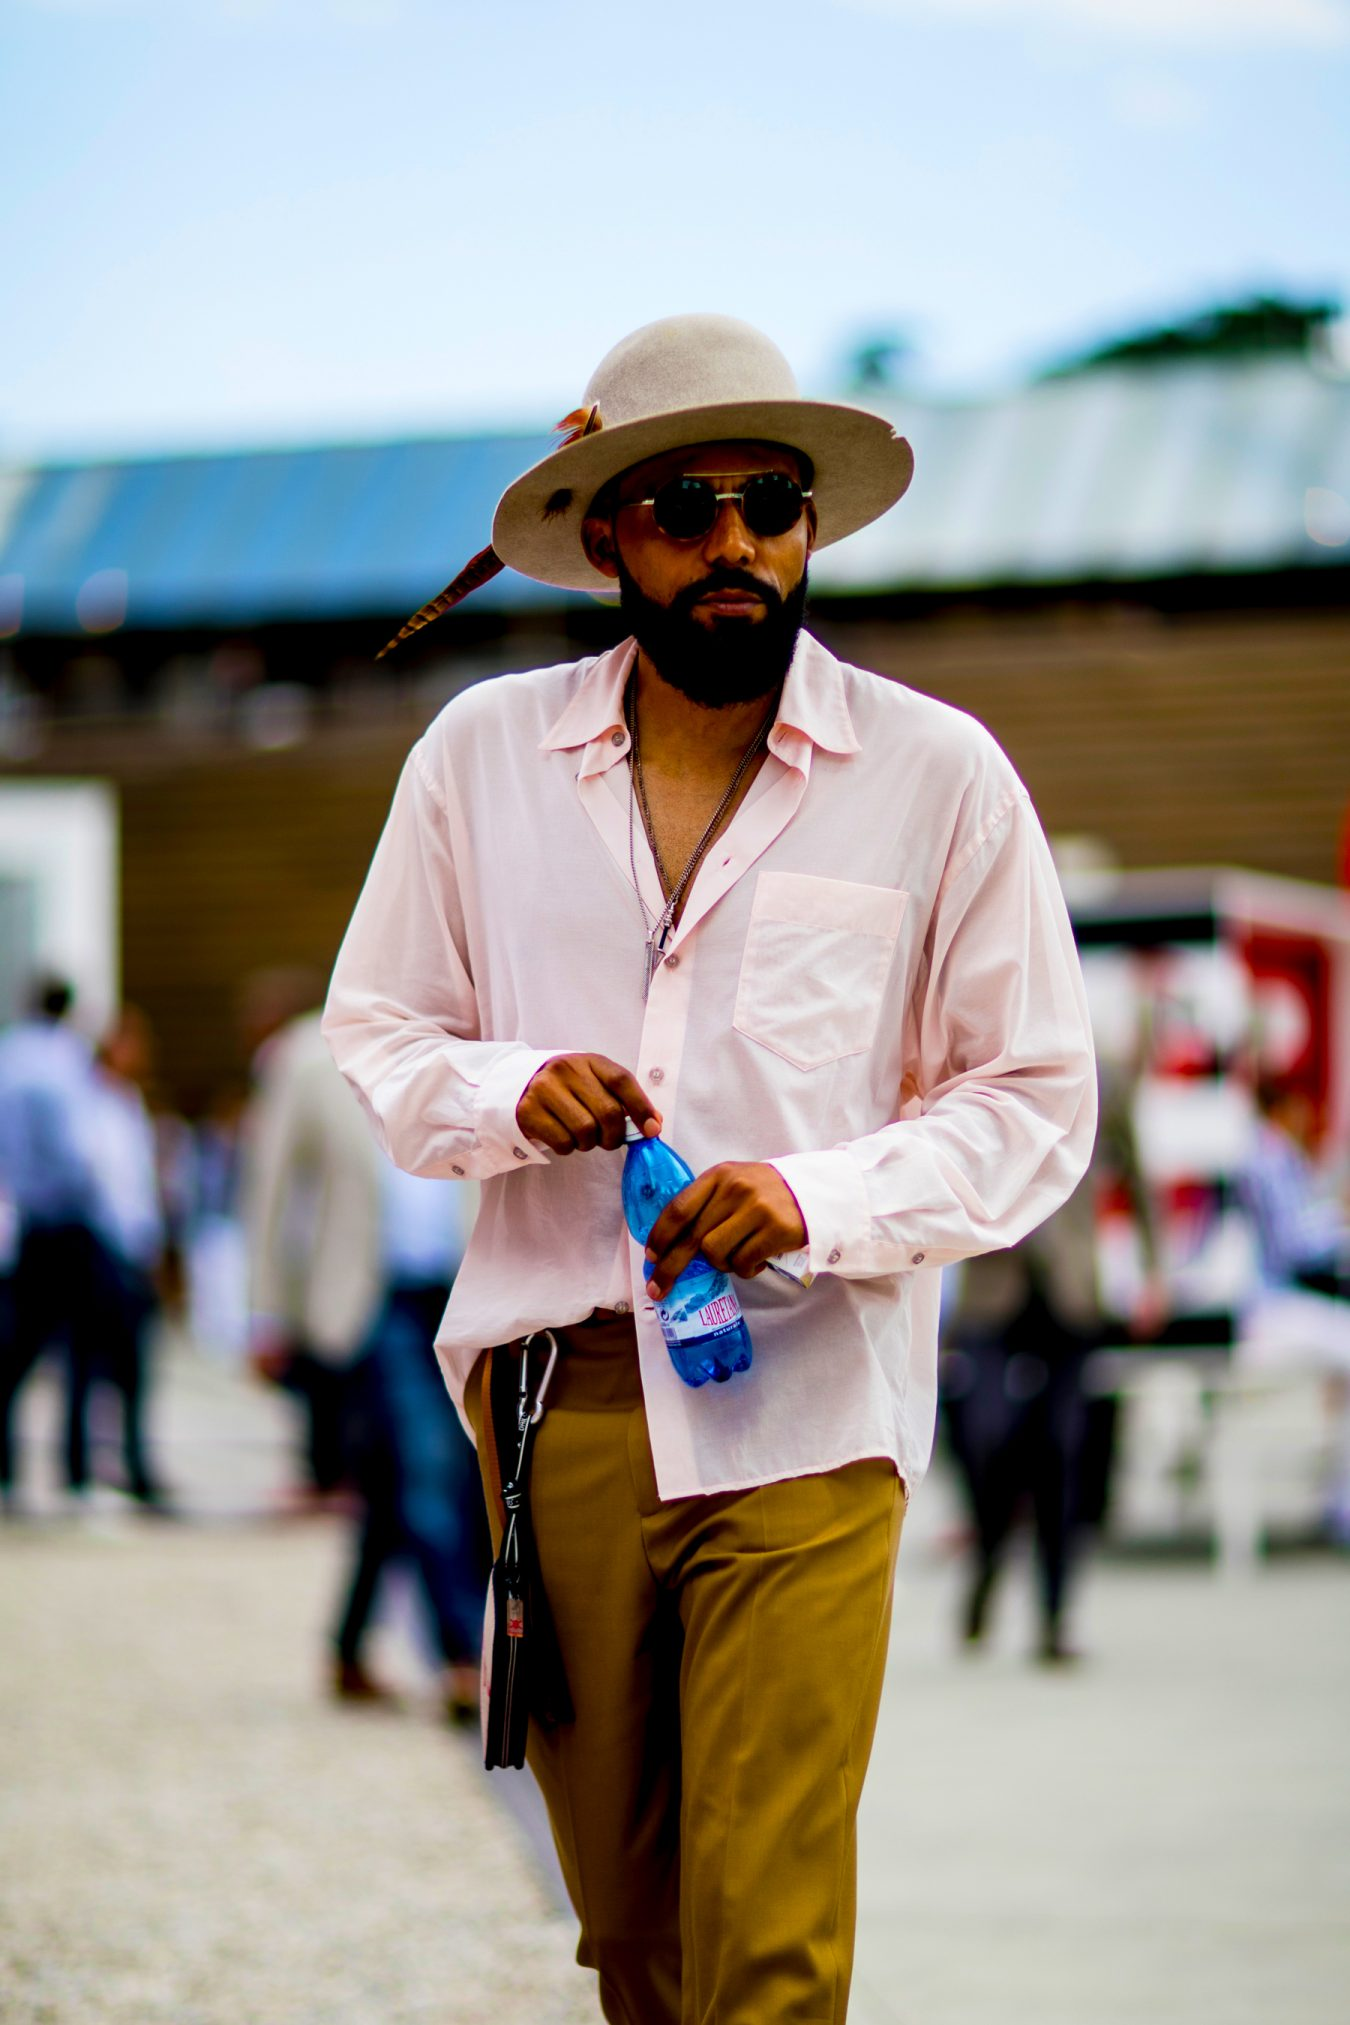 Firenze Pitti Uomo Fashion Week Men's Street Style Spring 2019 Day 1